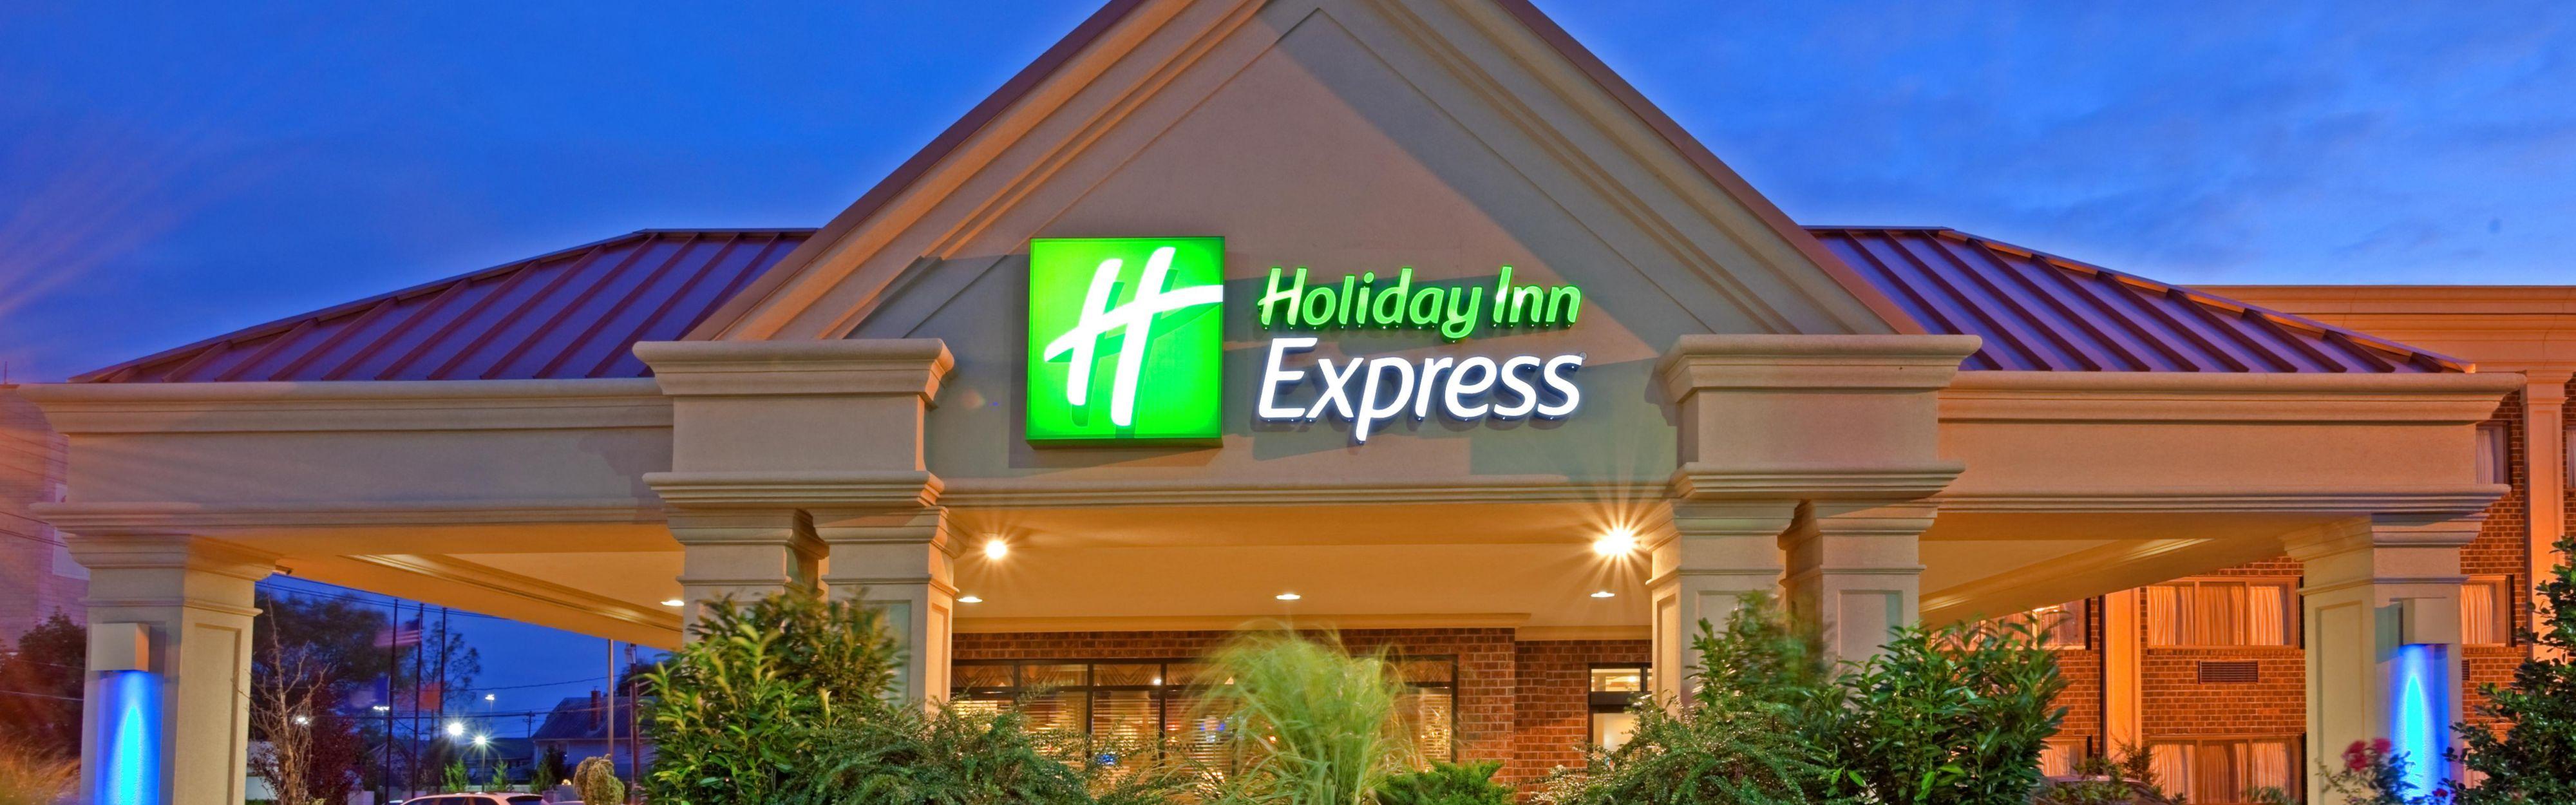 Holiday Inn Express Lynbrook - Rockville Centre image 0